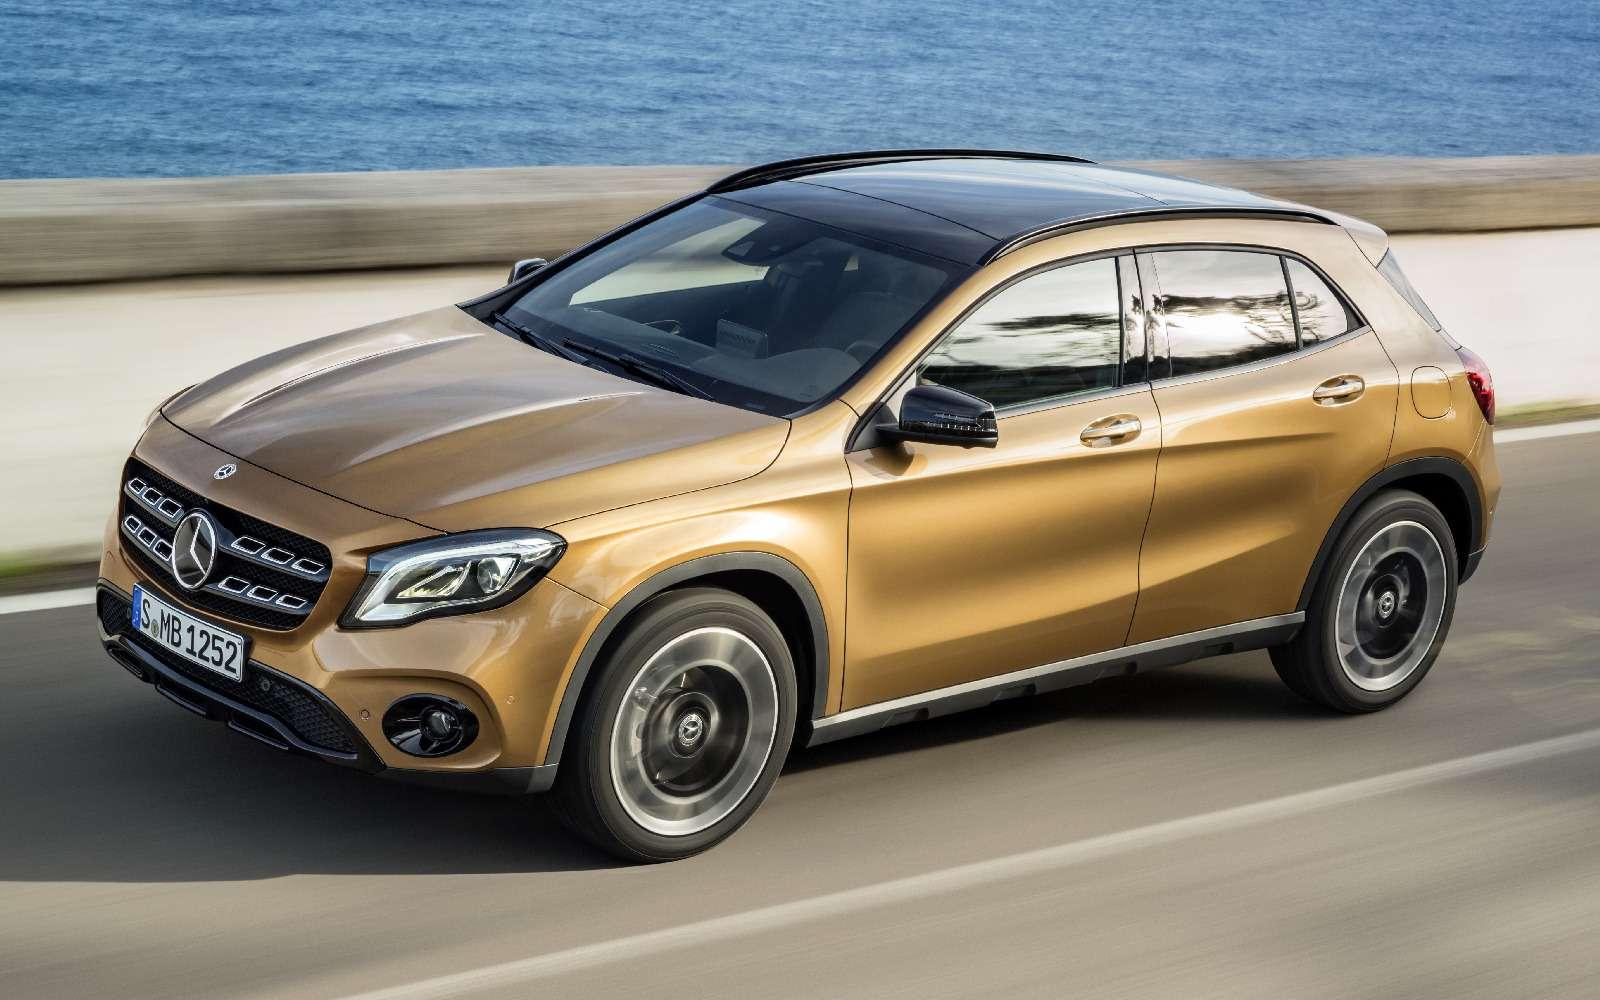 Mercedes-Benz GLA стал краше, ноне просторнее— фото 690070